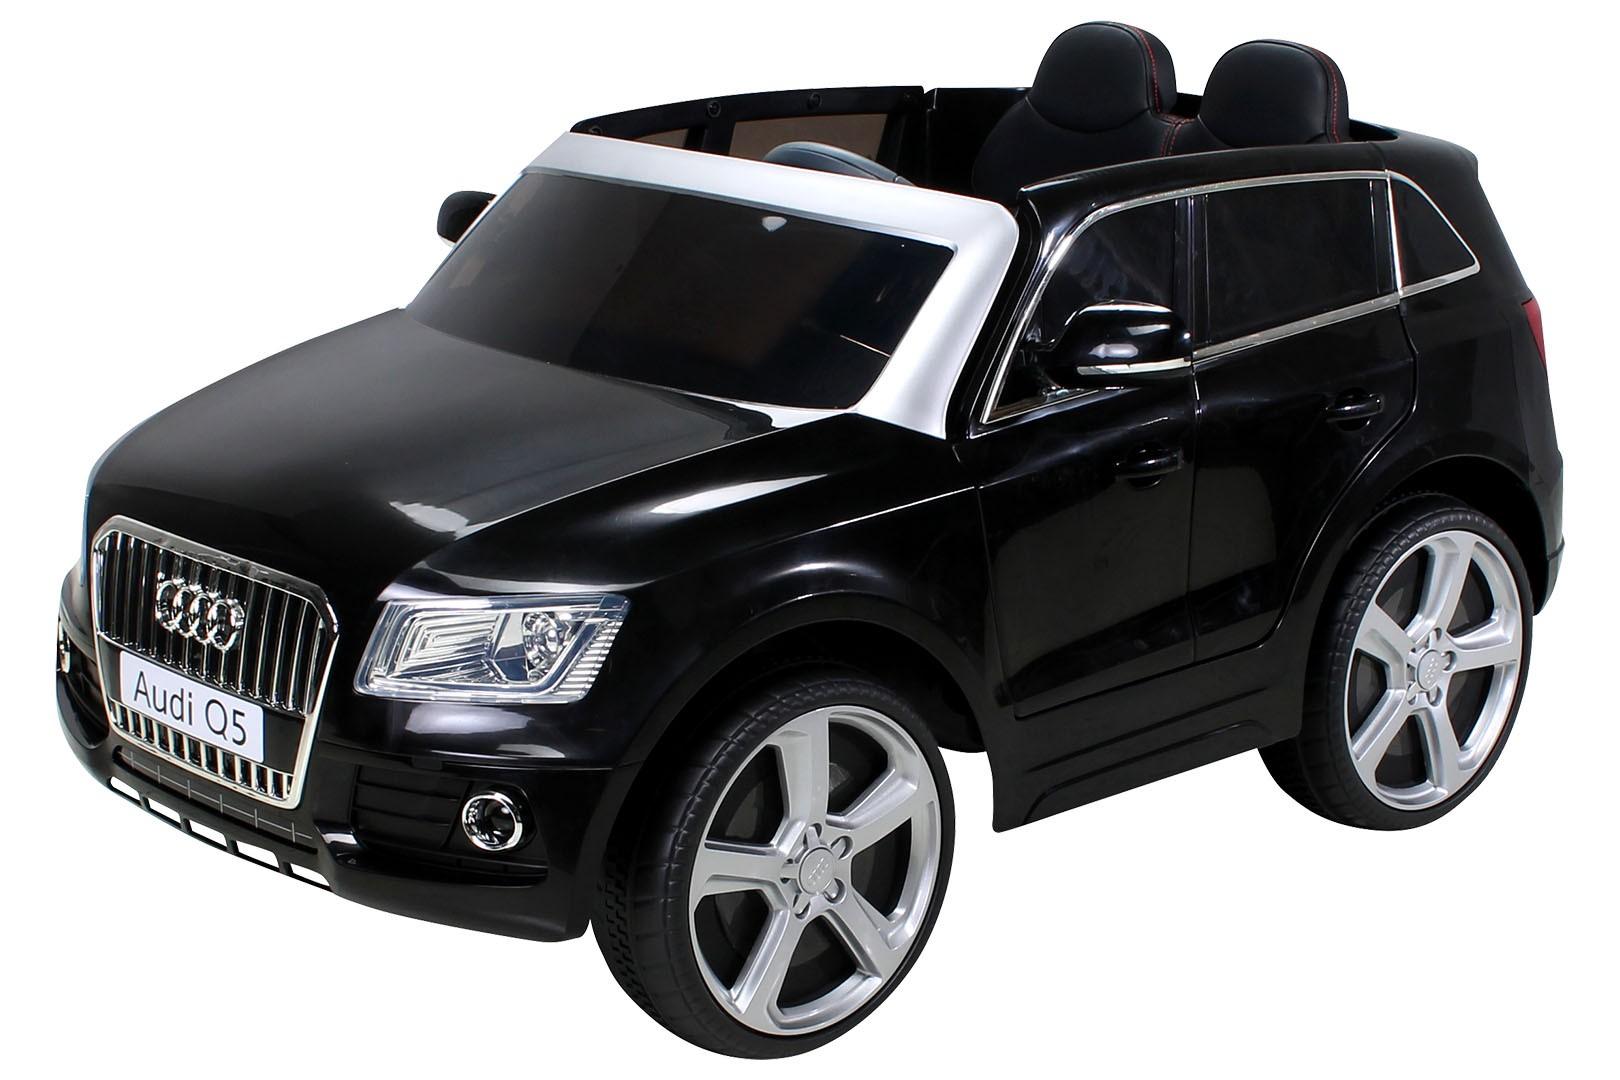 voiture lectrique audi q5 noir 2x35w 12v. Black Bedroom Furniture Sets. Home Design Ideas